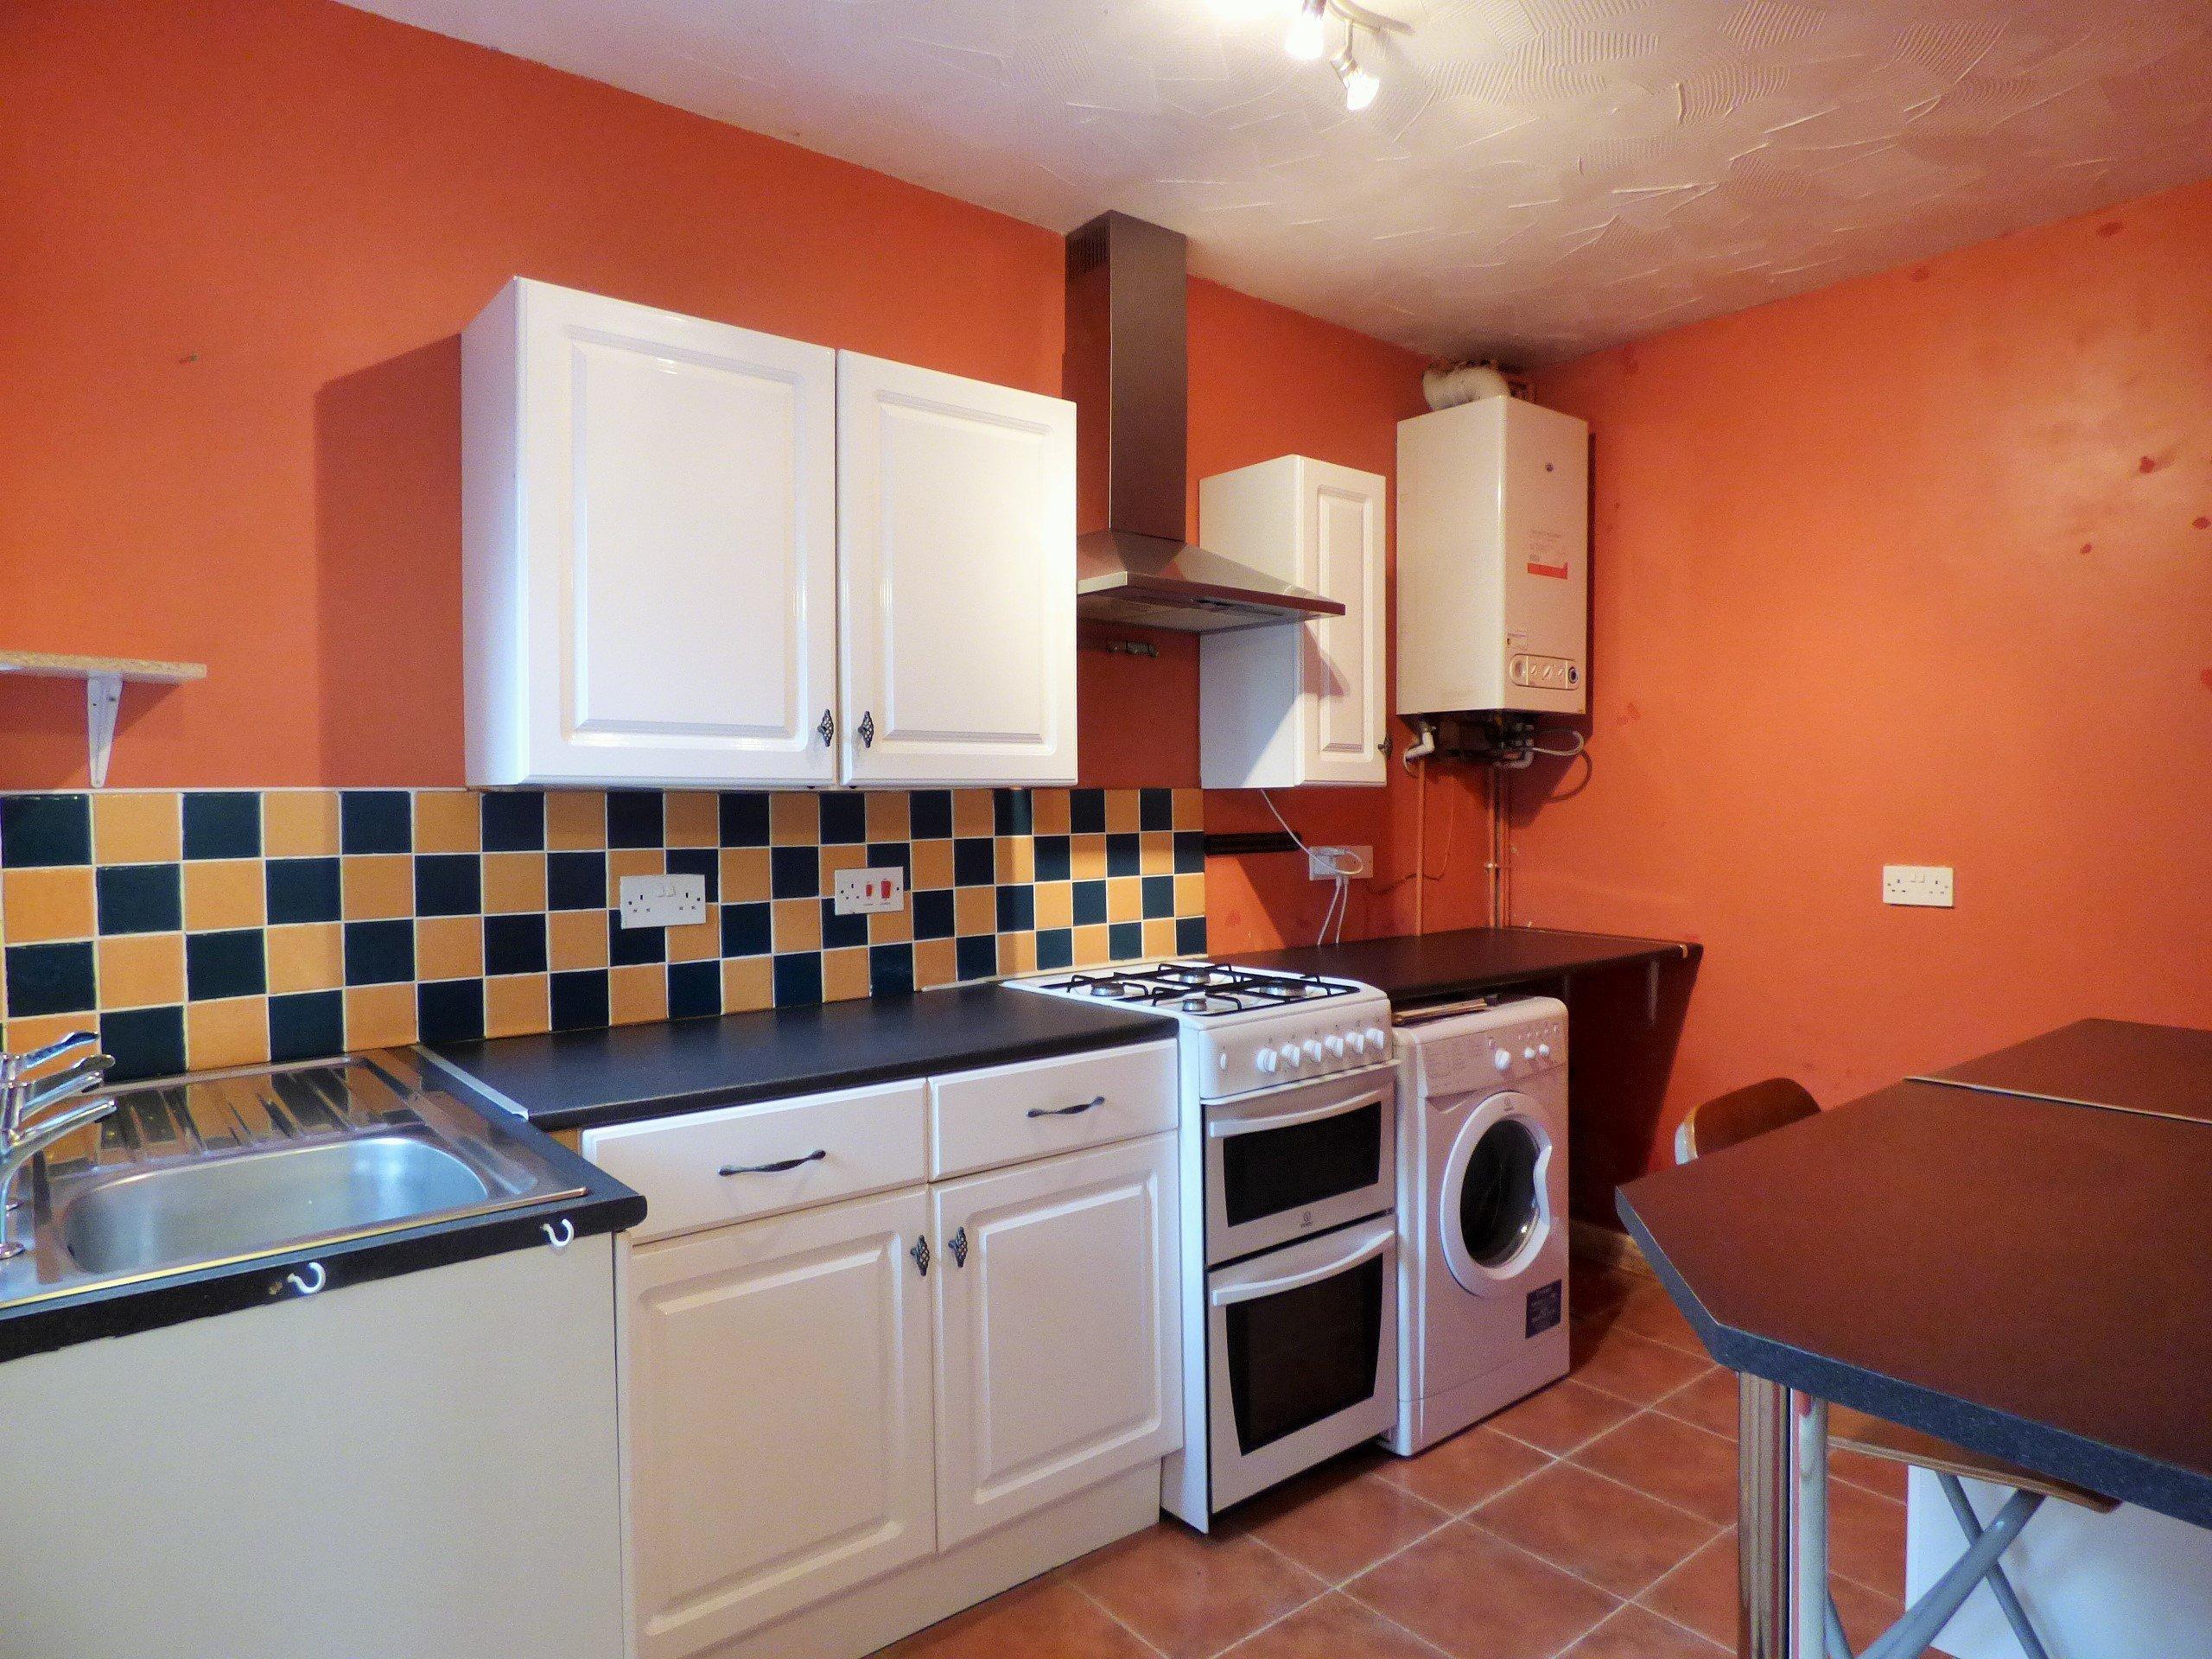 Wisemove. Property for sale. Bridgend Road, Pontycymer. Kitchen